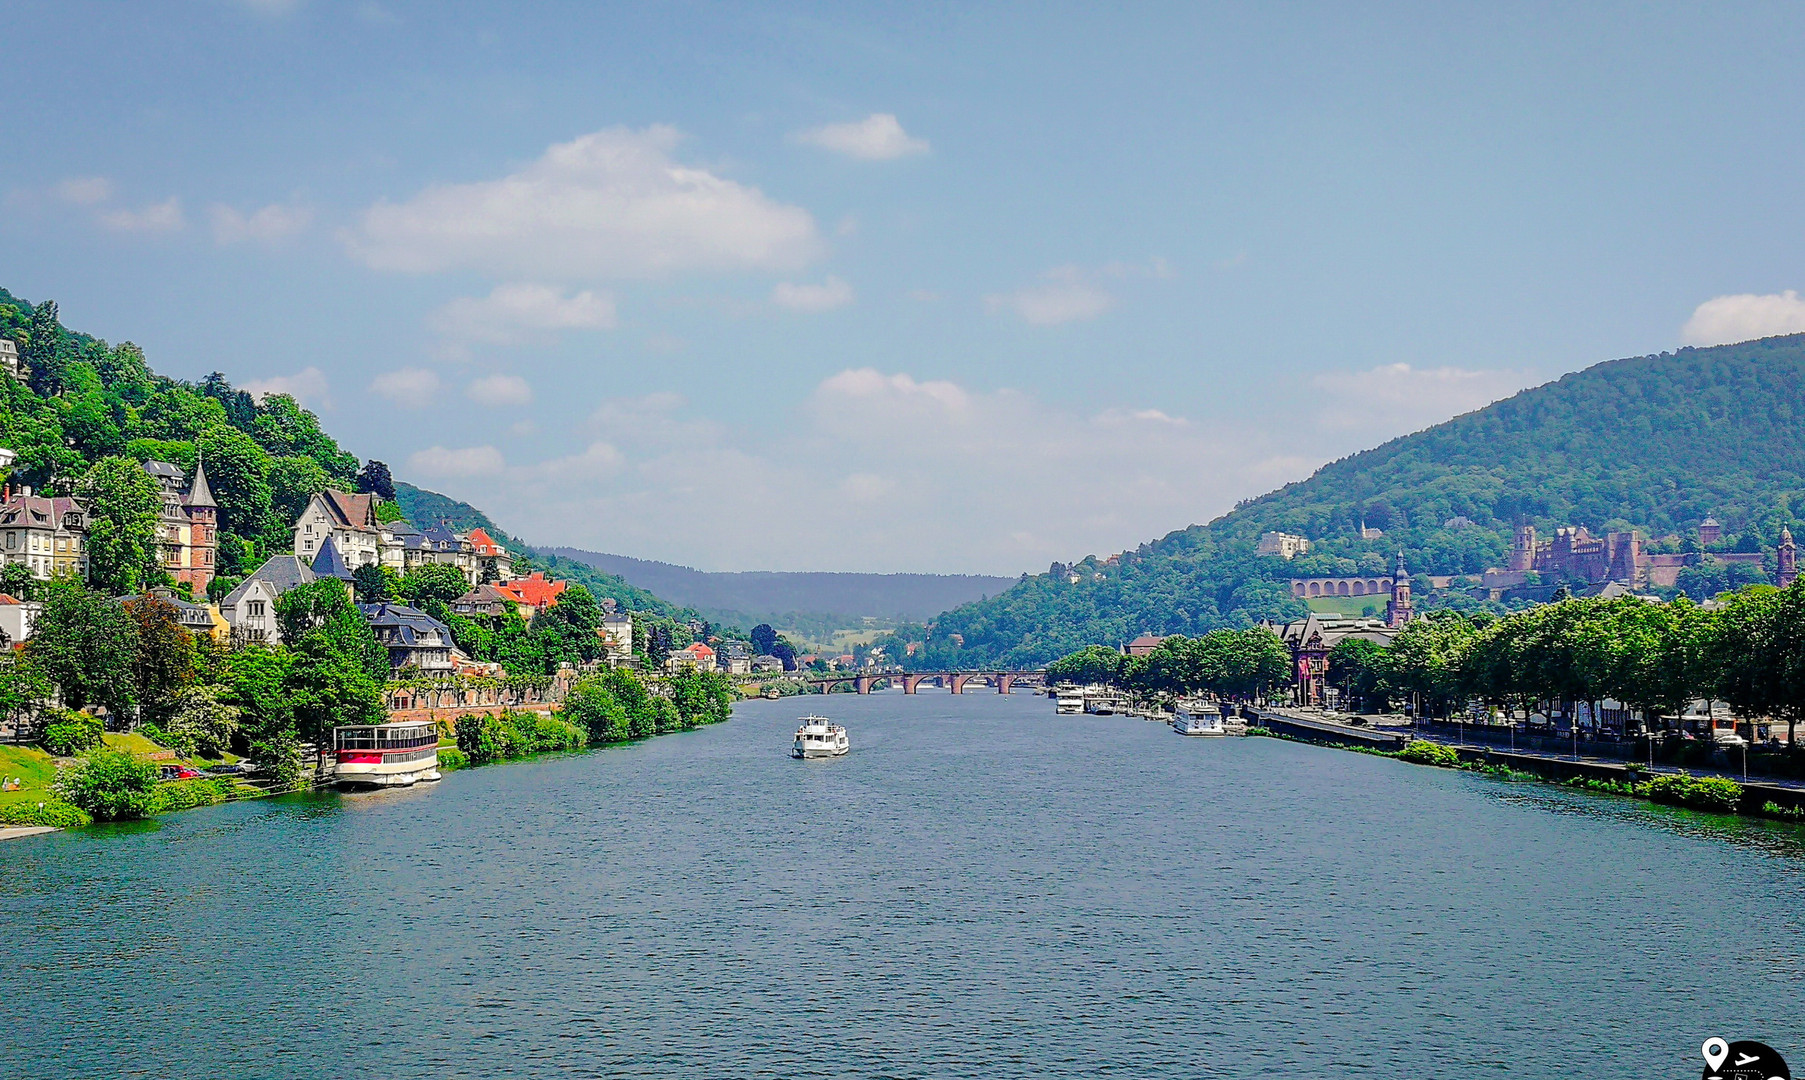 Панорама реки Неккар, Гейдельберг